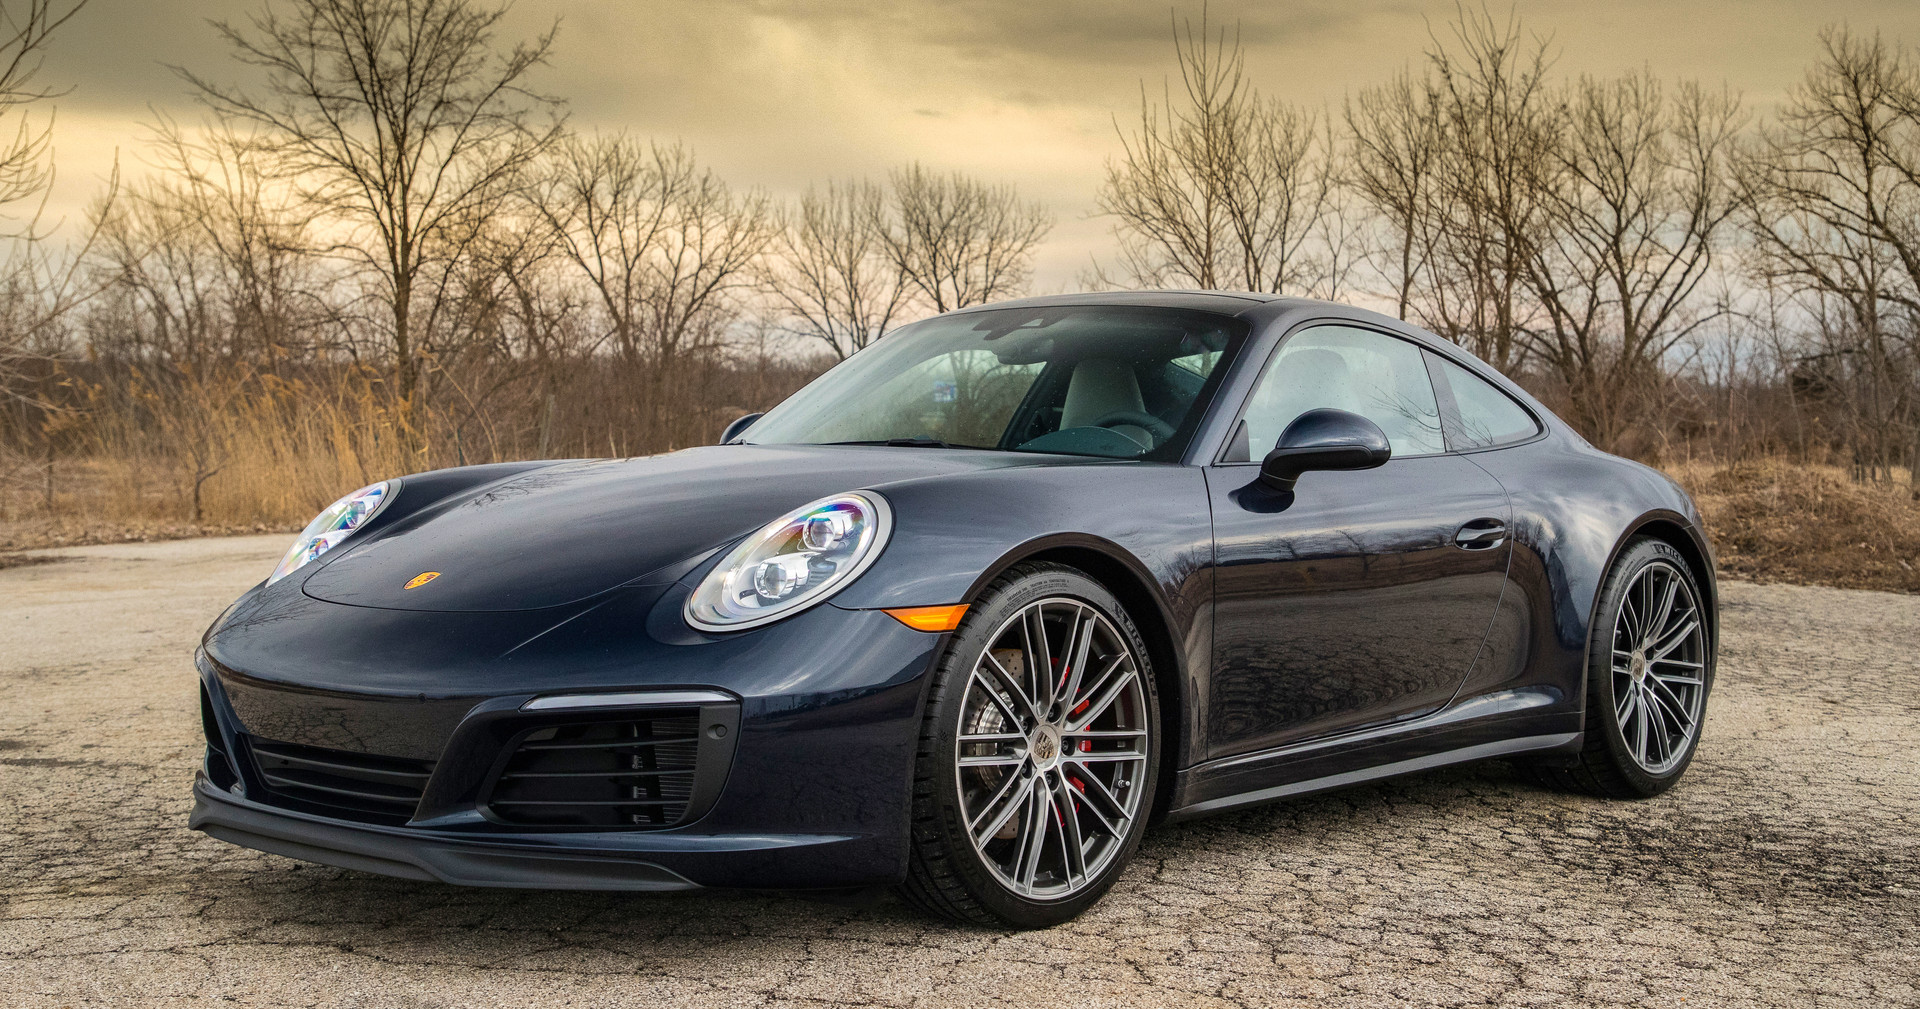 Porsche of Peoria